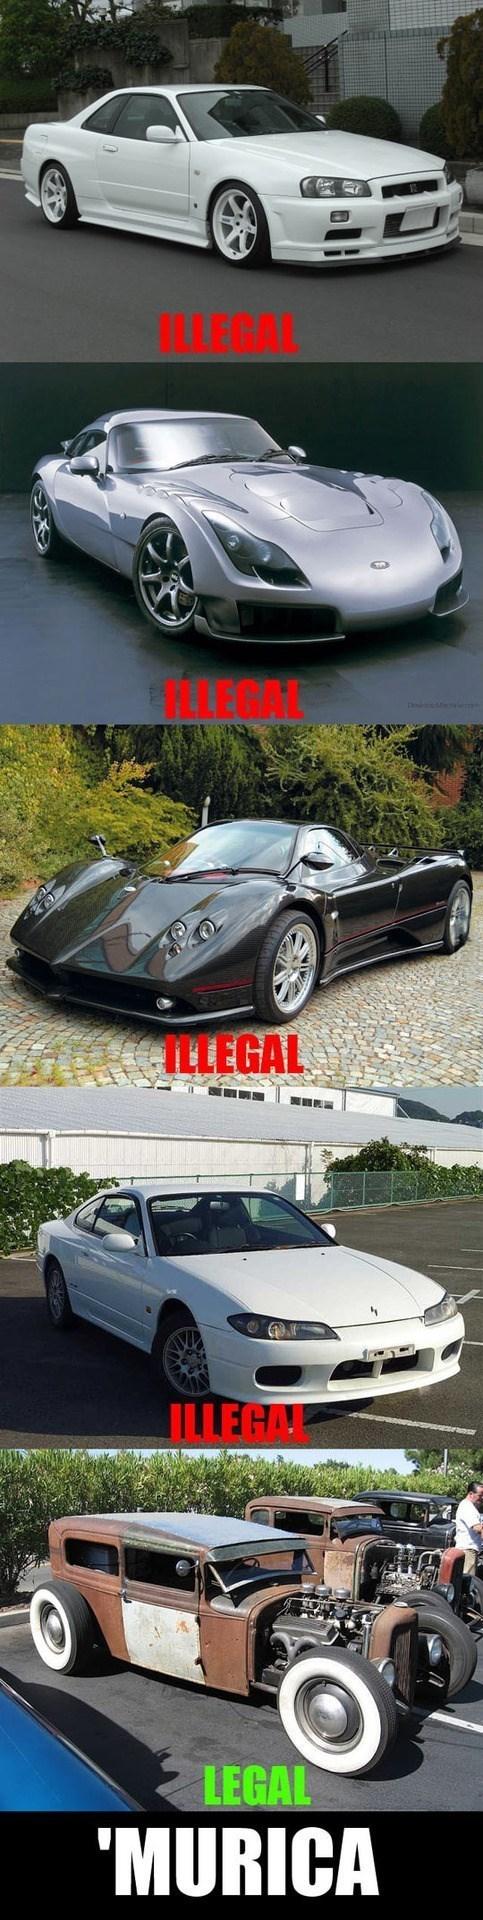 street legal cars - 8292651008